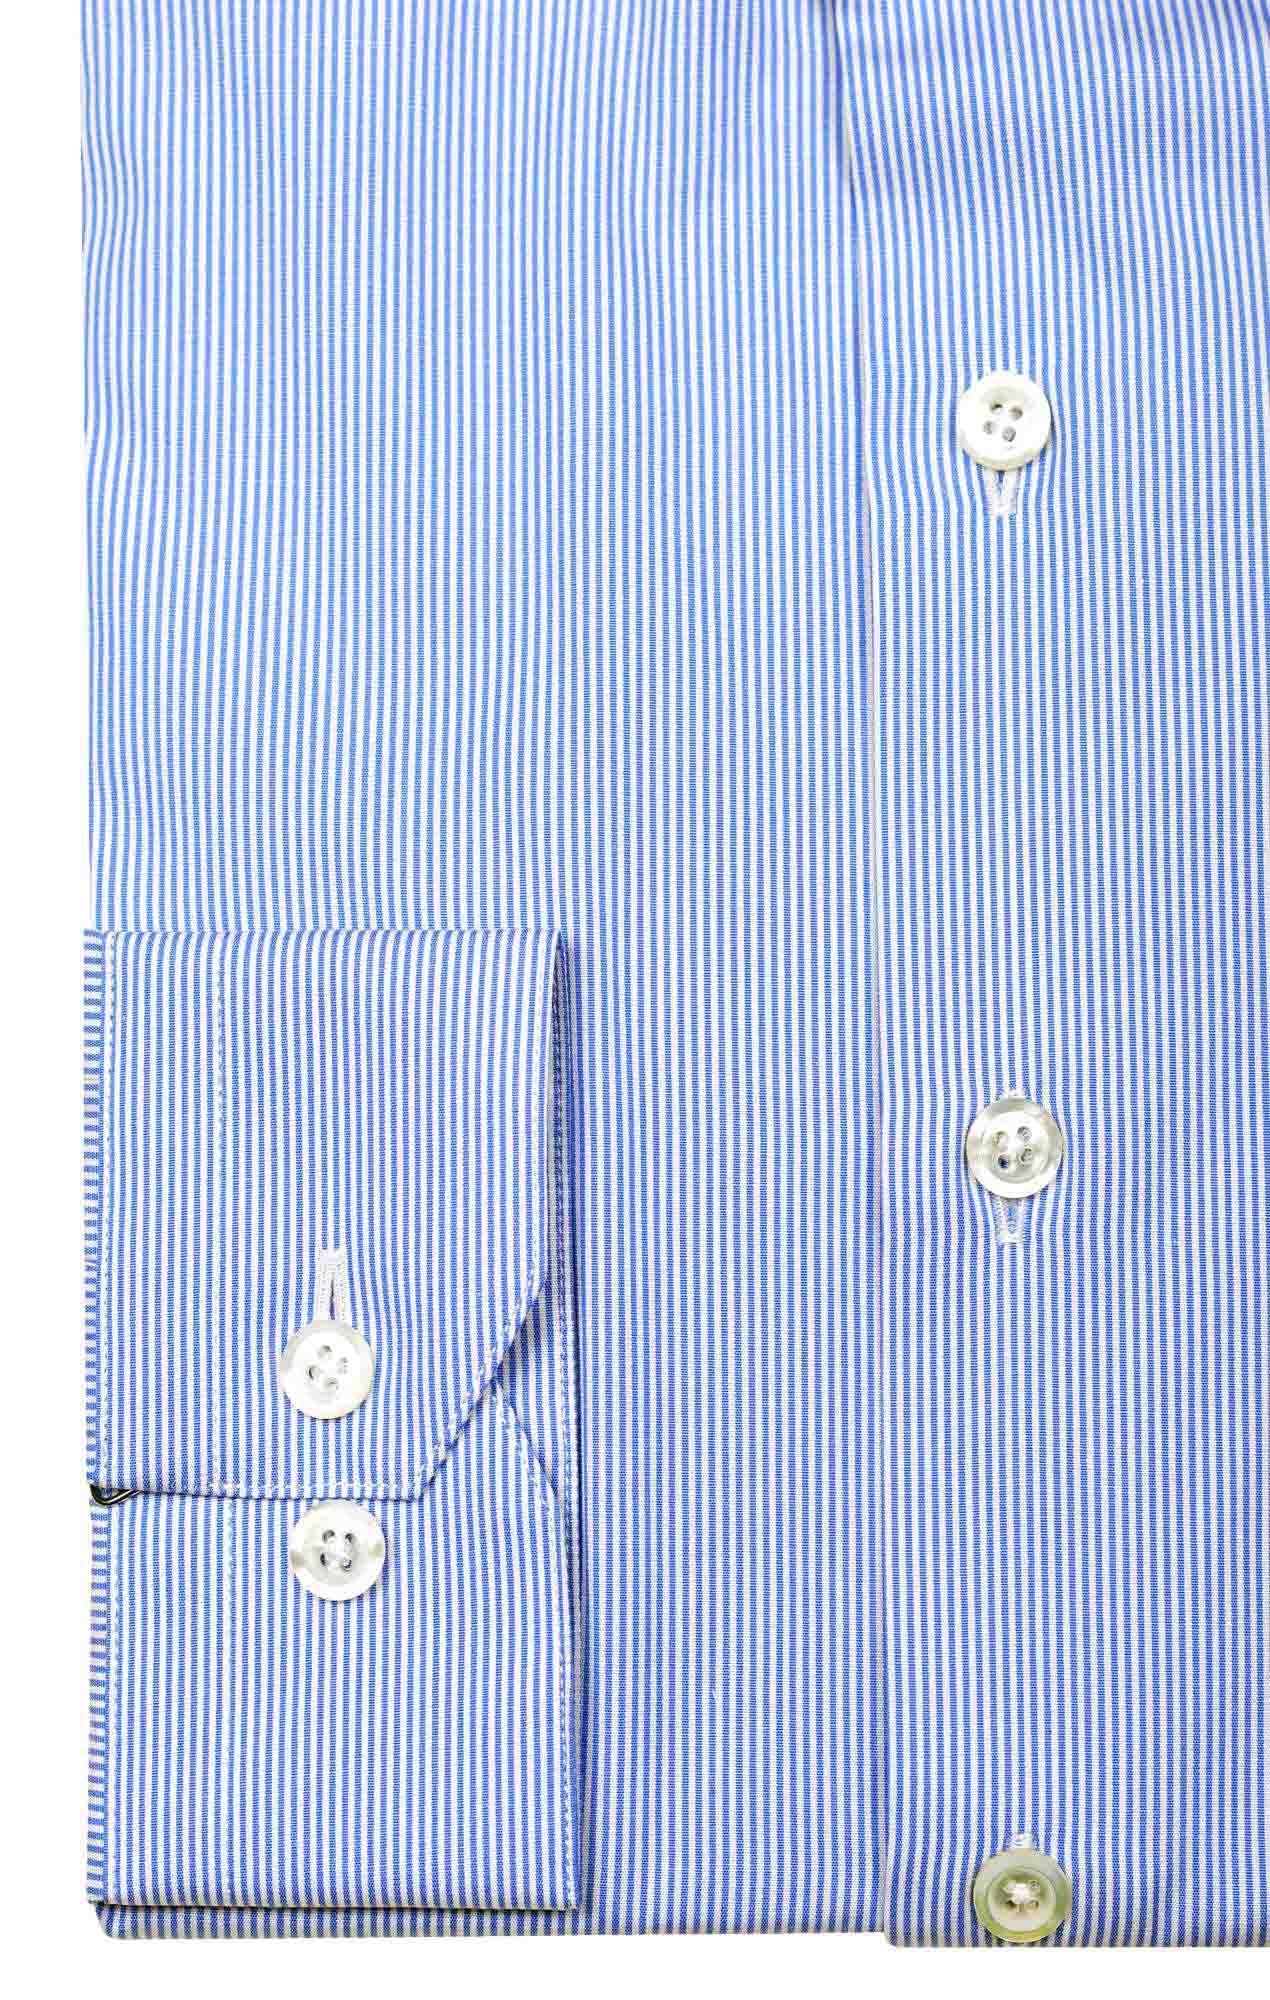 Chemise à rayures equidistantes Chemises Hommes